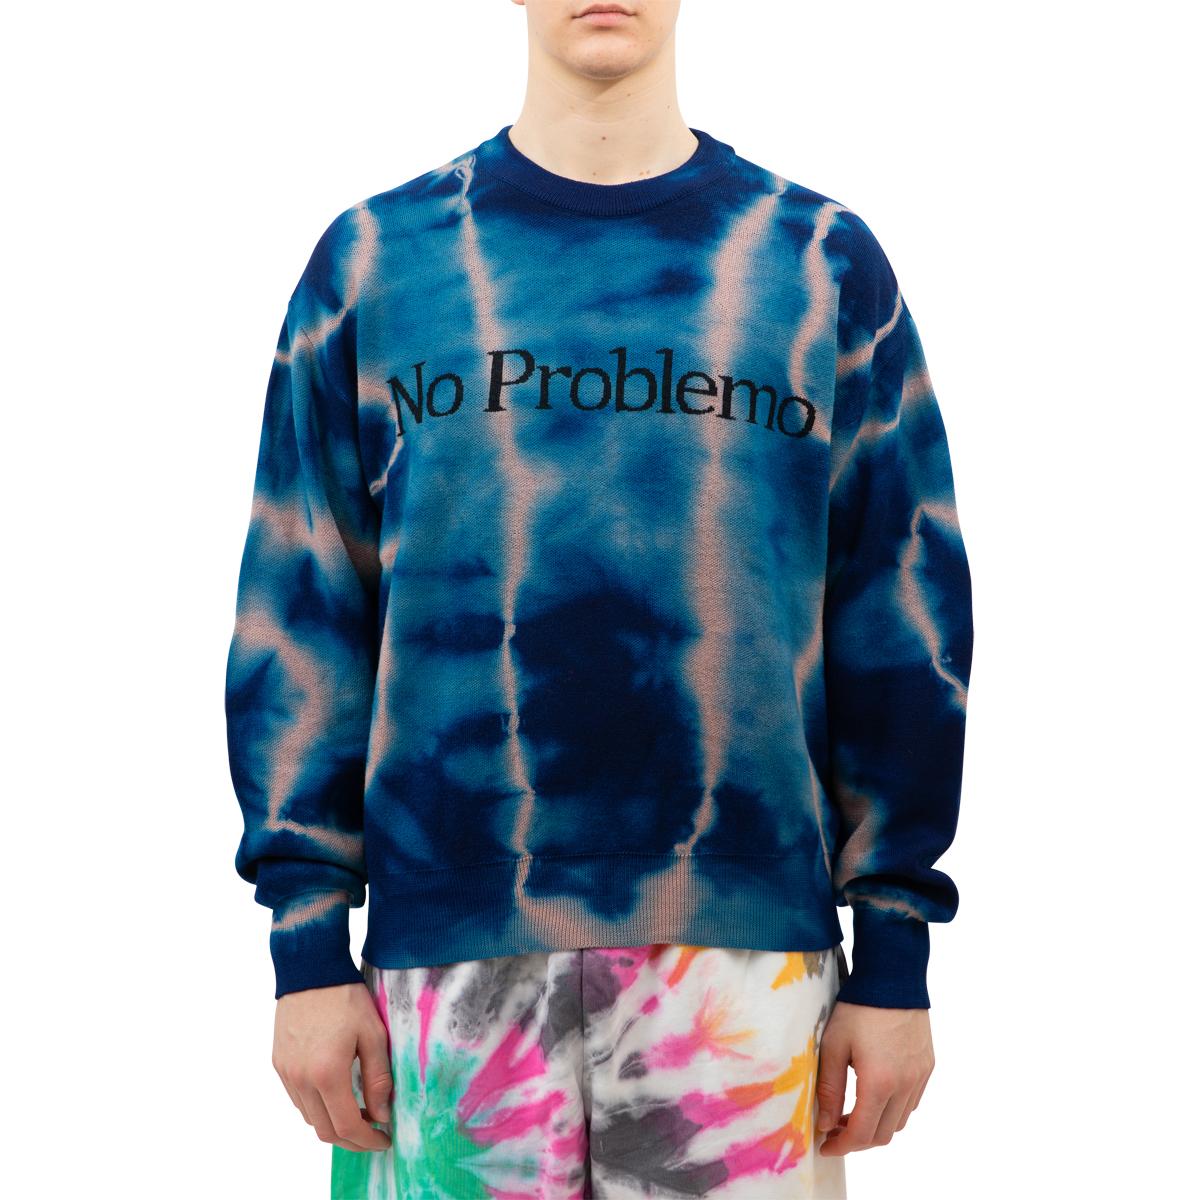 Aries No Problemo Tie Dye Jumper